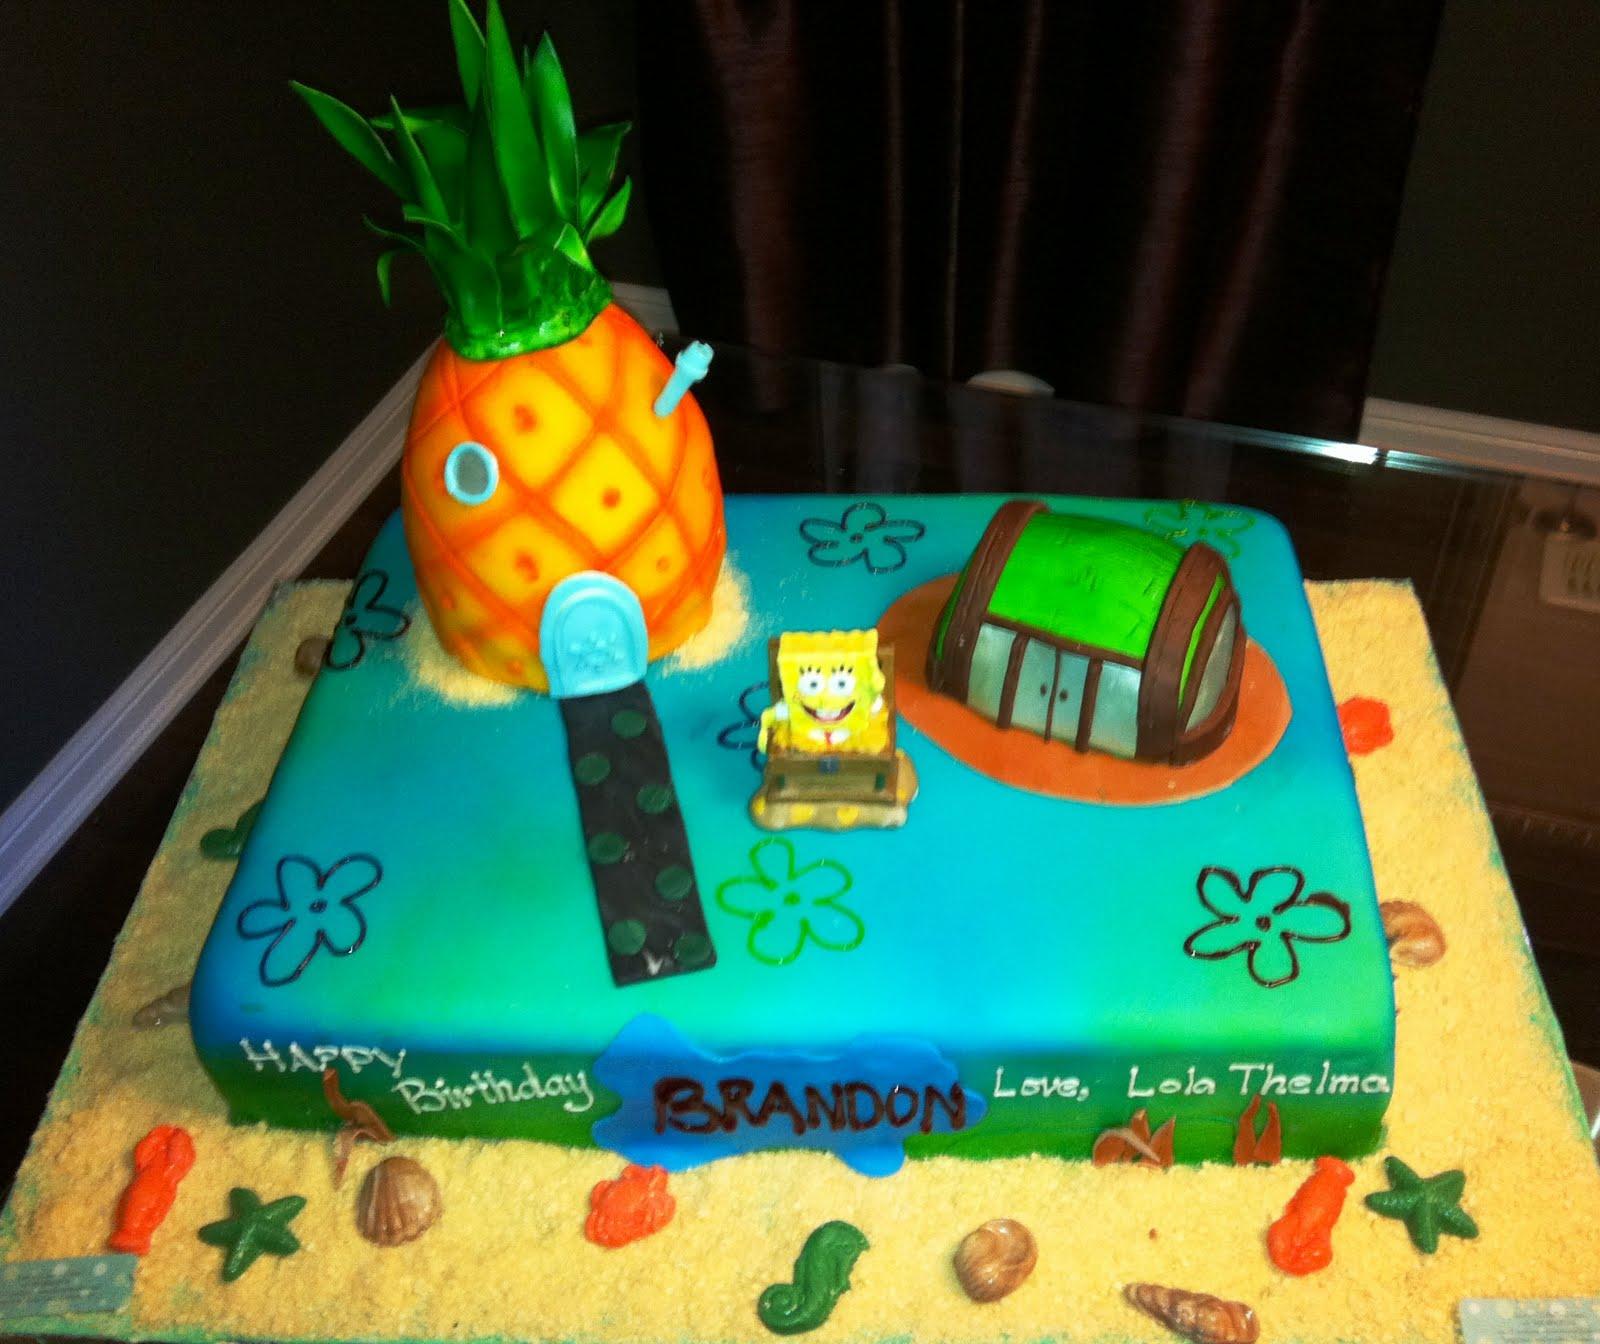 Jocelyns Wedding Cakes and More Spongebob CakeMarkham 1st